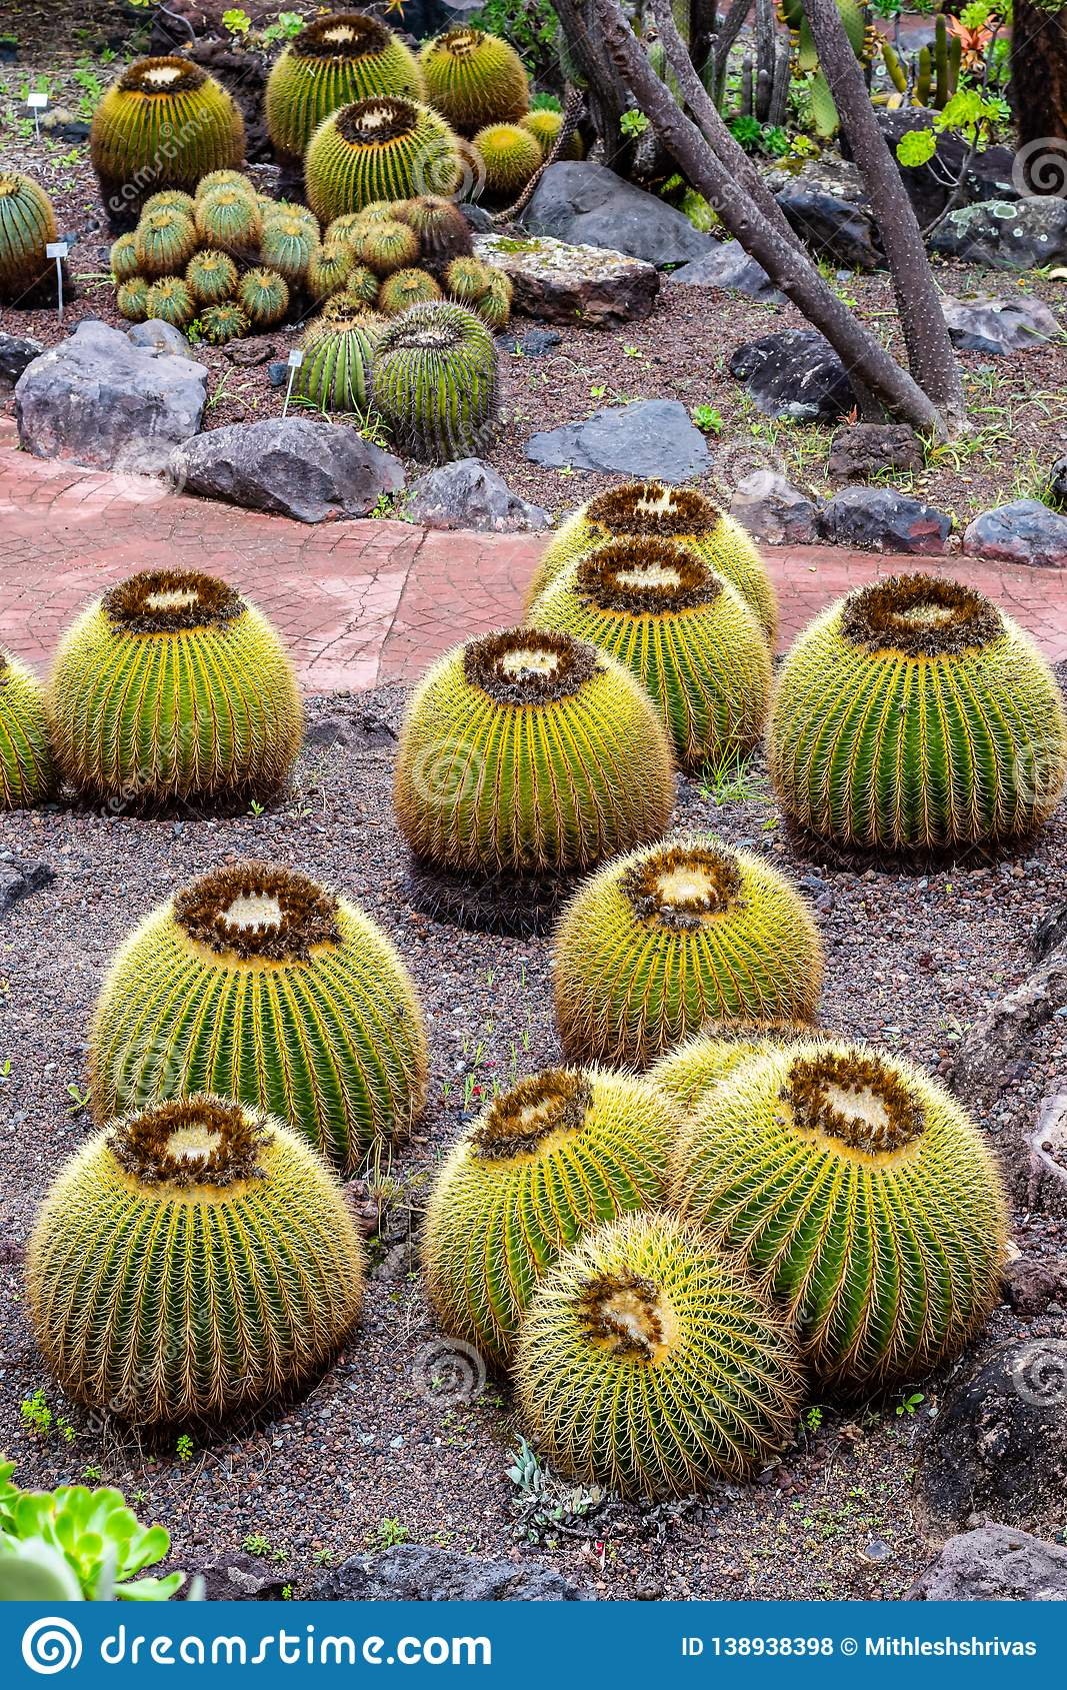 Grown Golden Barrel Cactus in Jardin botanical park, Gran canaria, Spain